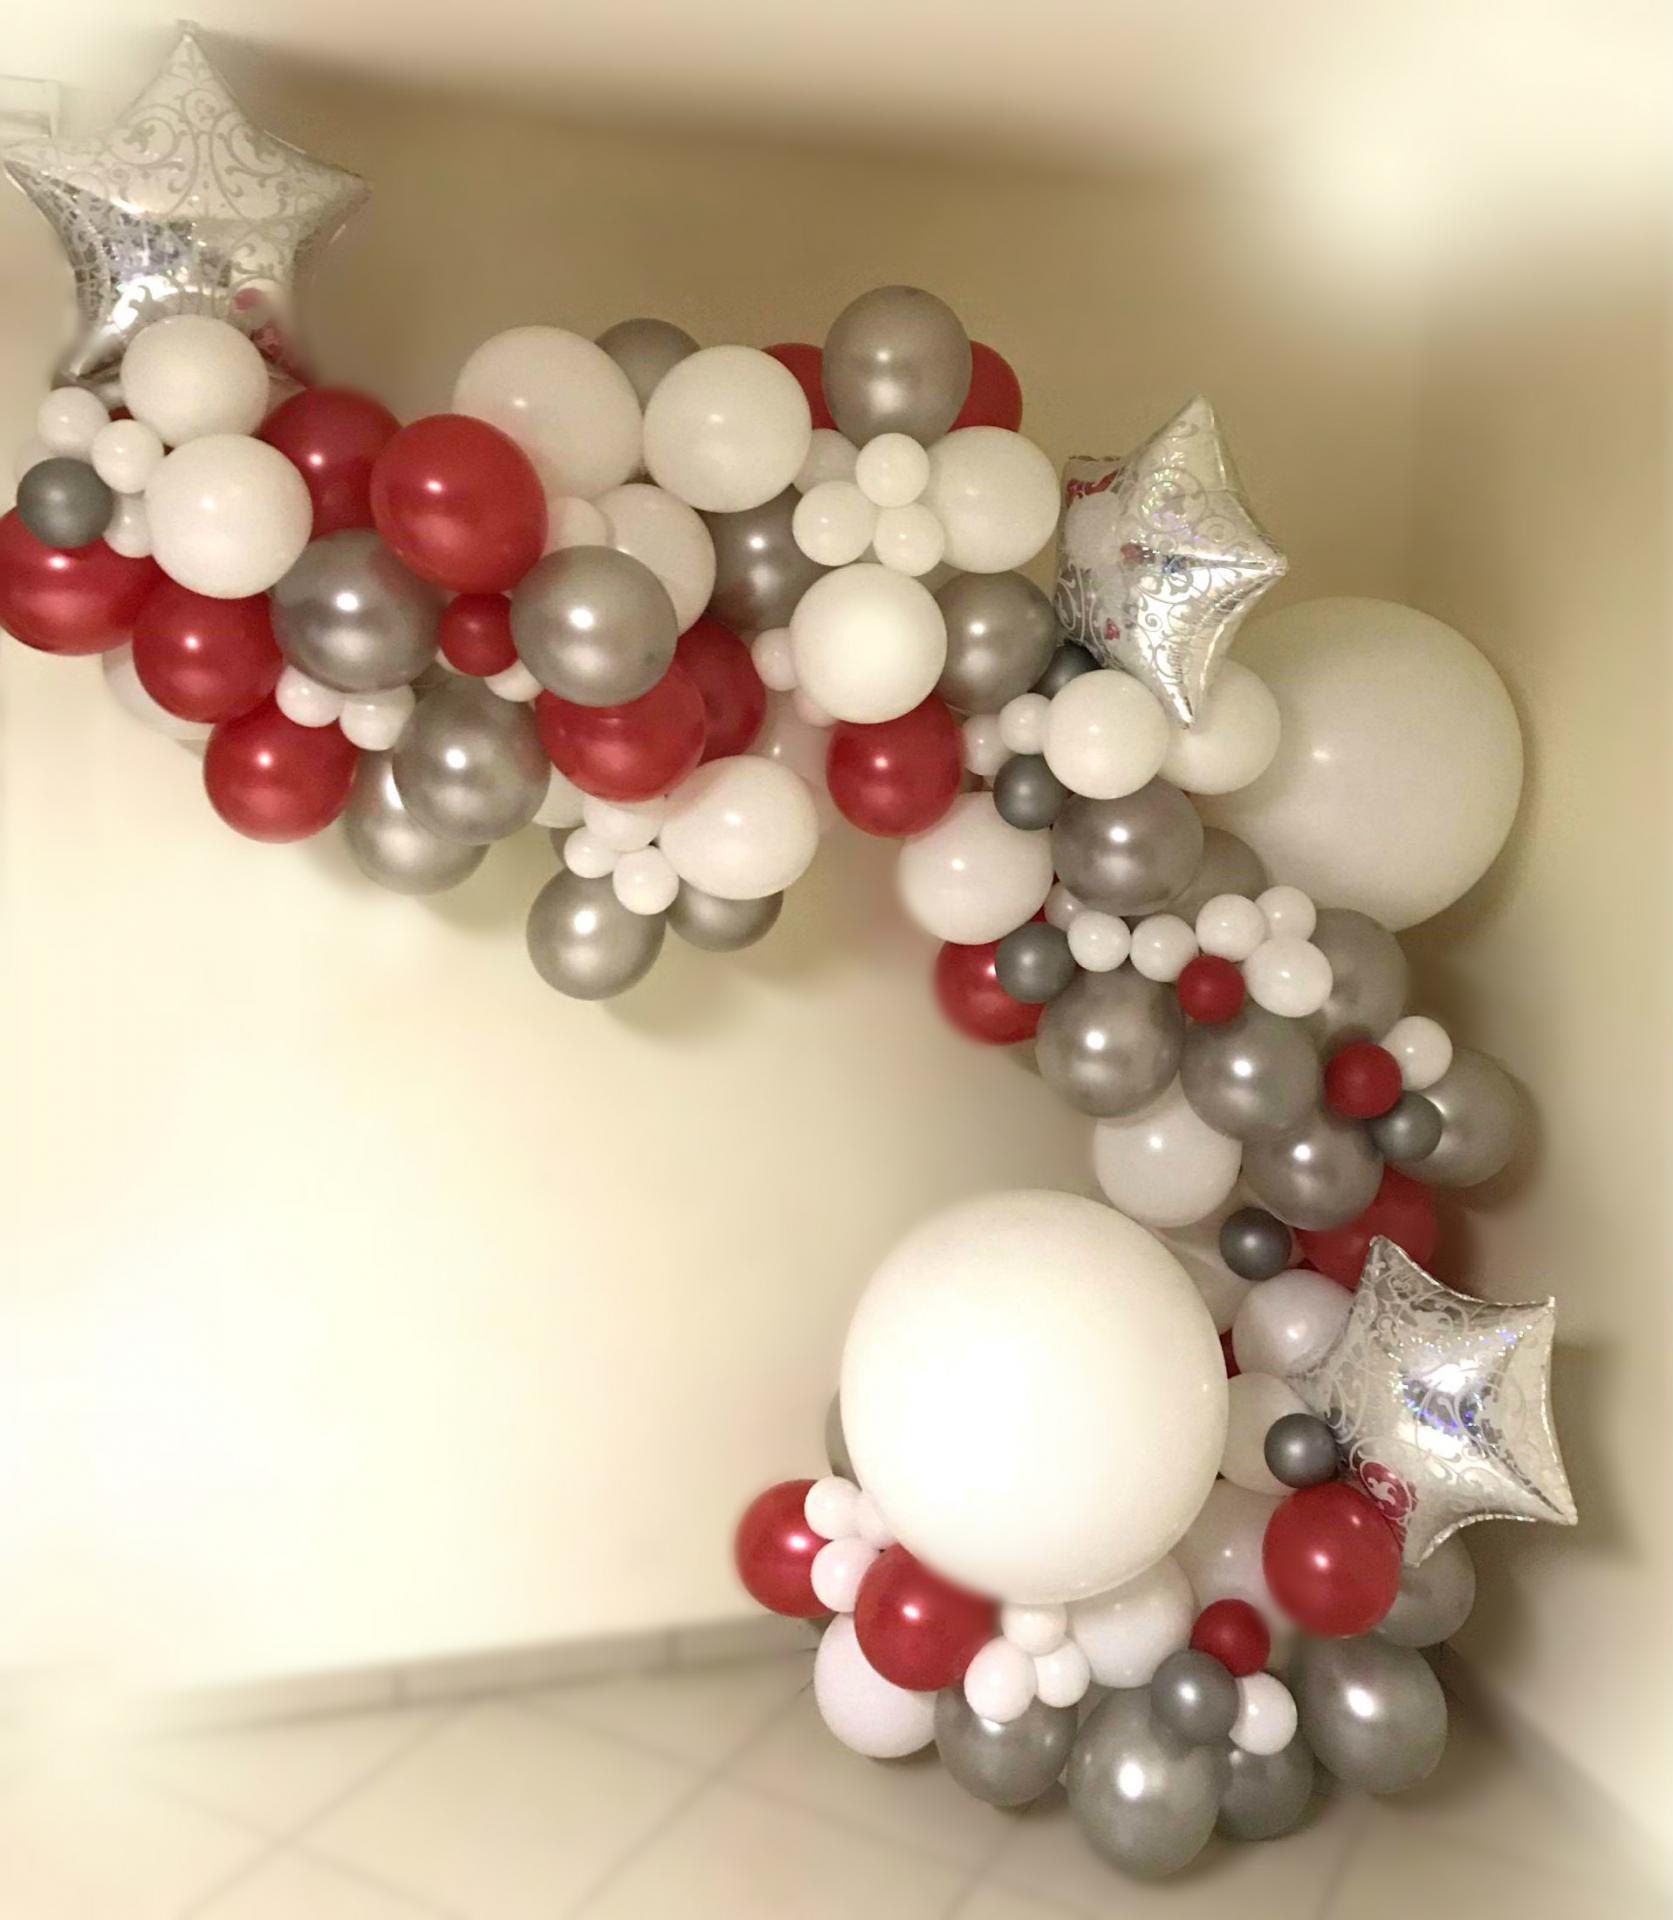 Demi Arche festive avec Ballons